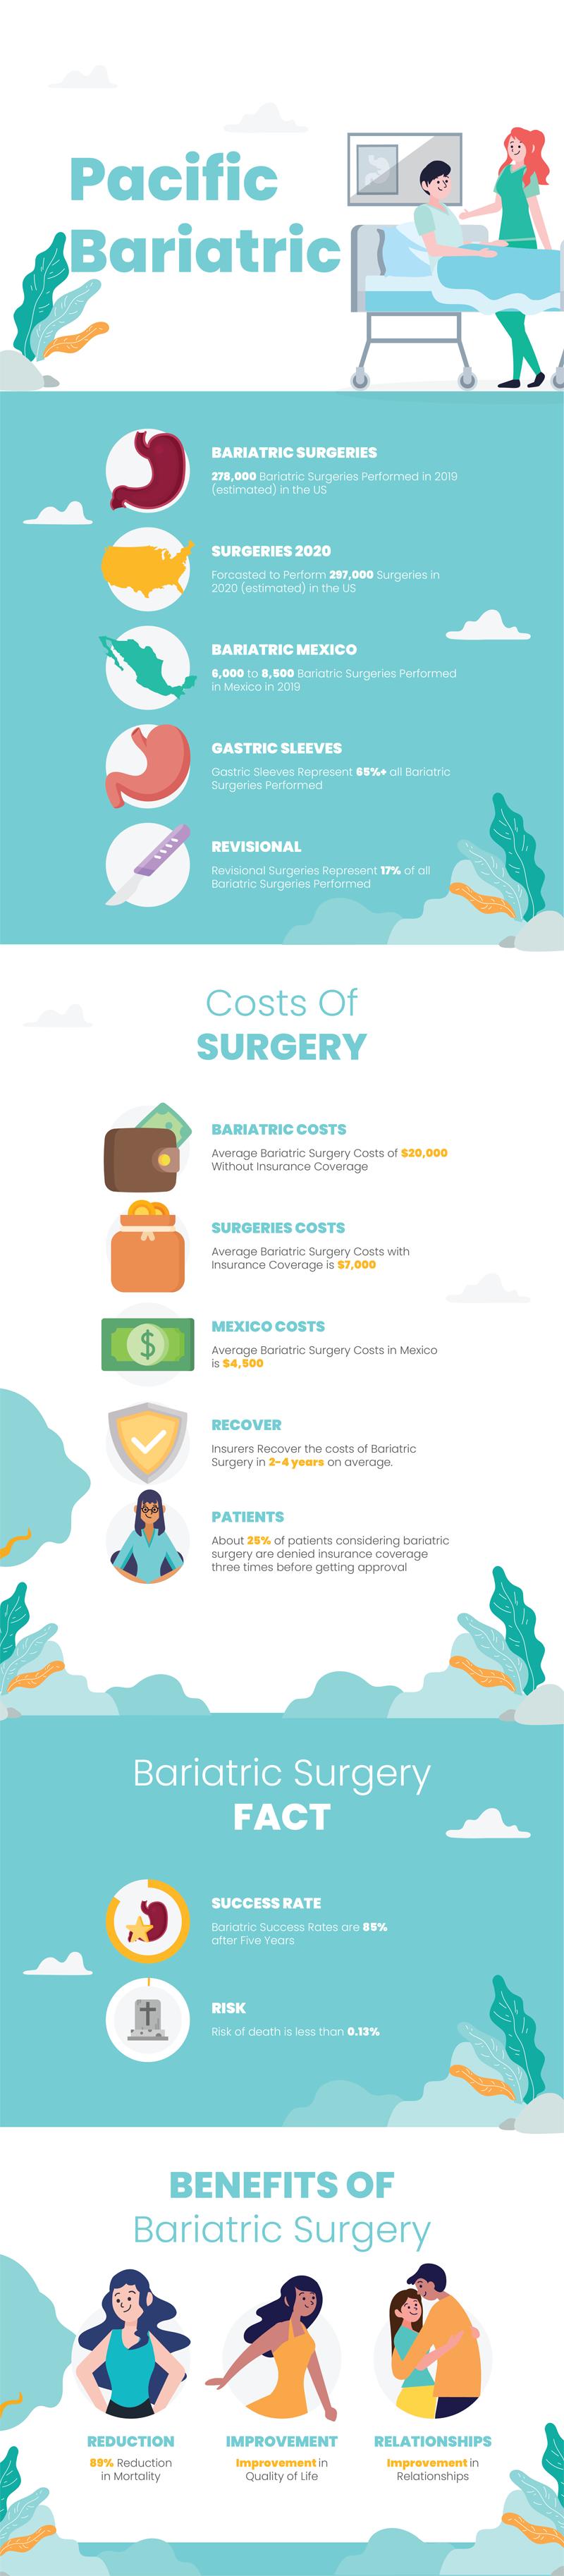 Bariatric Surgery Statistics in 2020